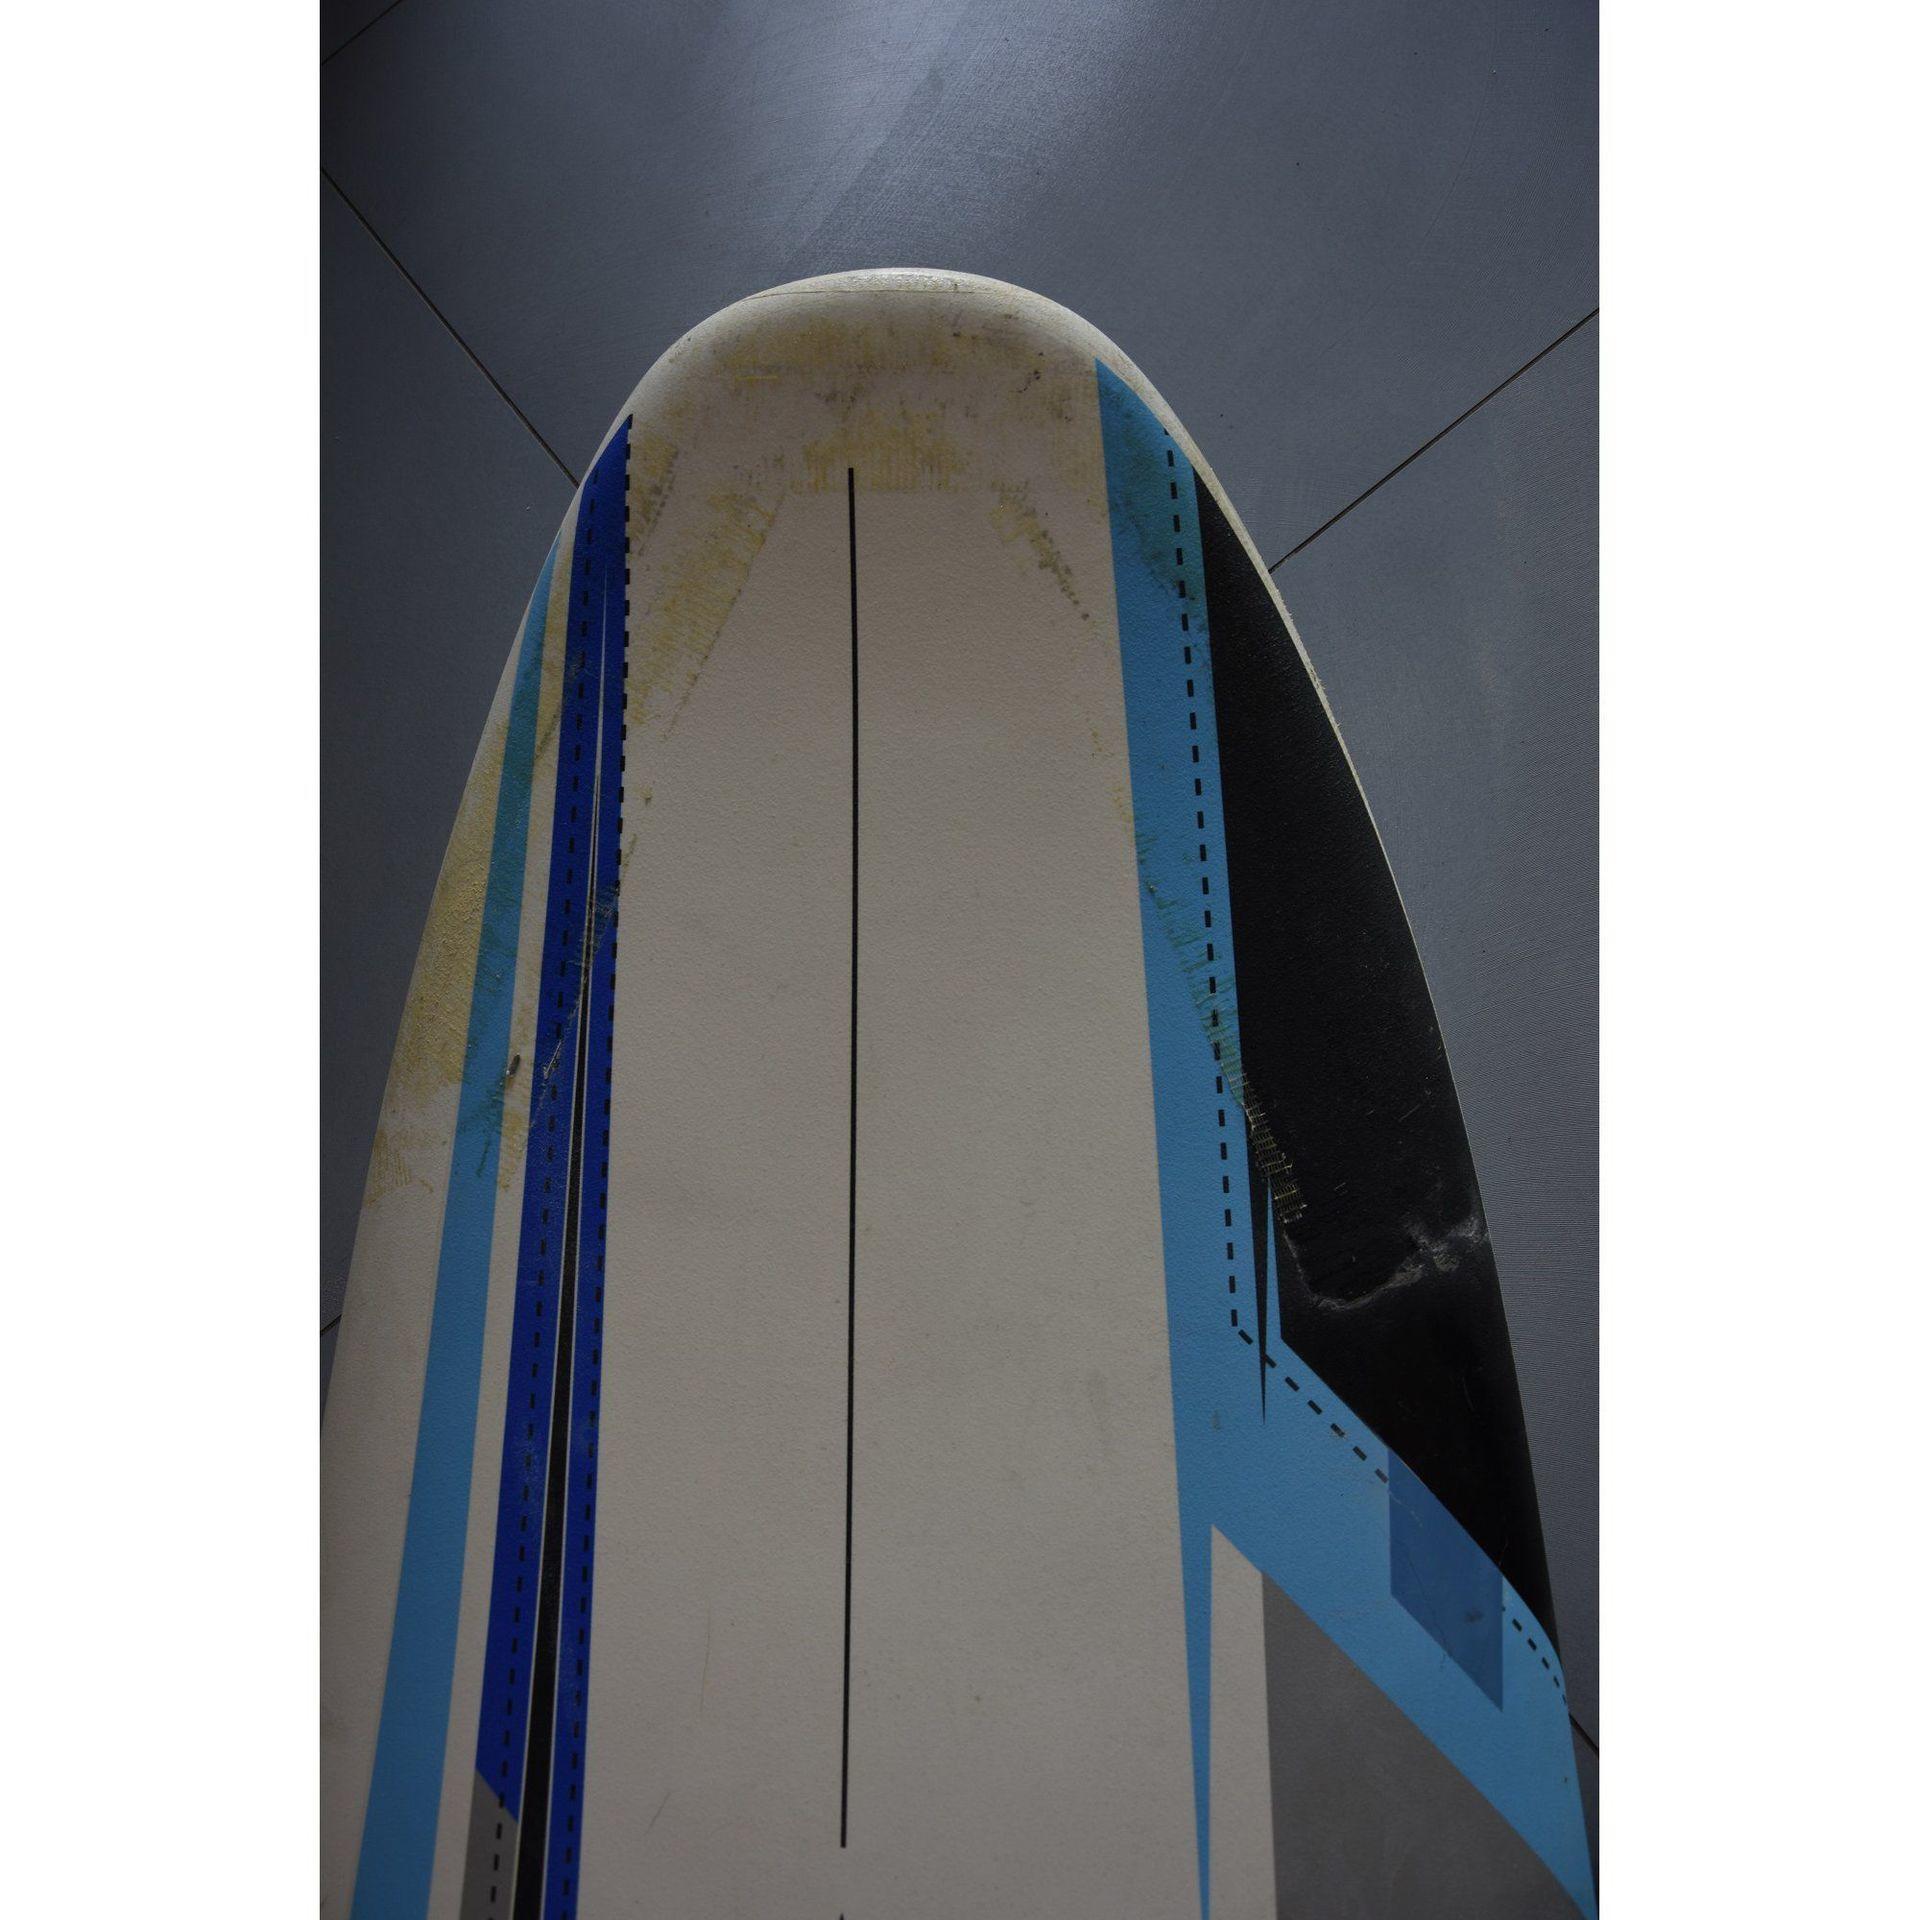 DESKA JP FUN RIDE 2012 130 3